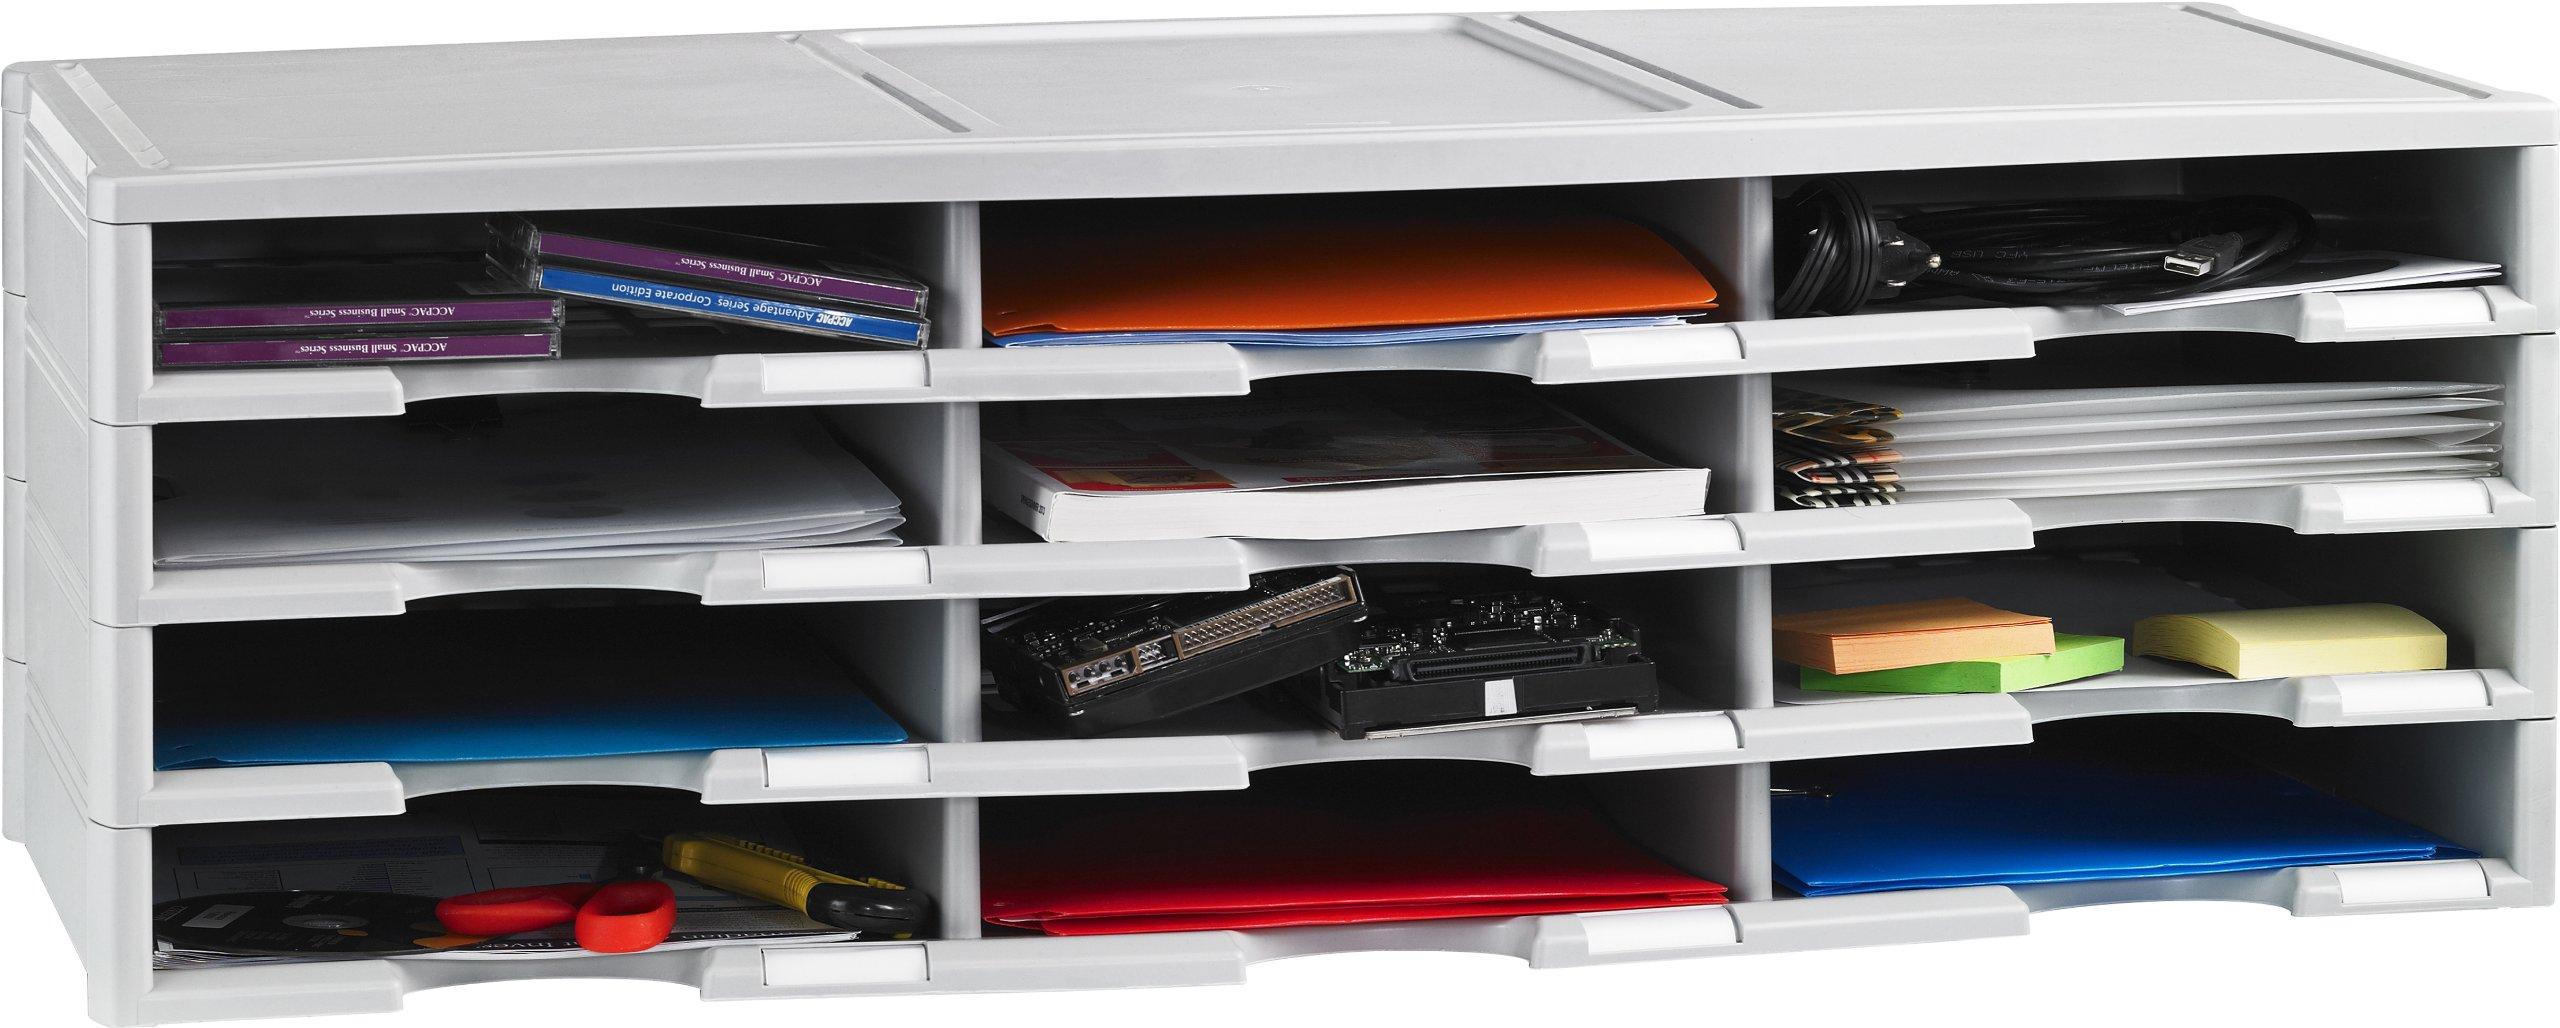 Storex 12-Compartment Literature Organizer/Document Sorter, 31.38 x 14.13 x 10.5 Inches, Gray (61431U01C)